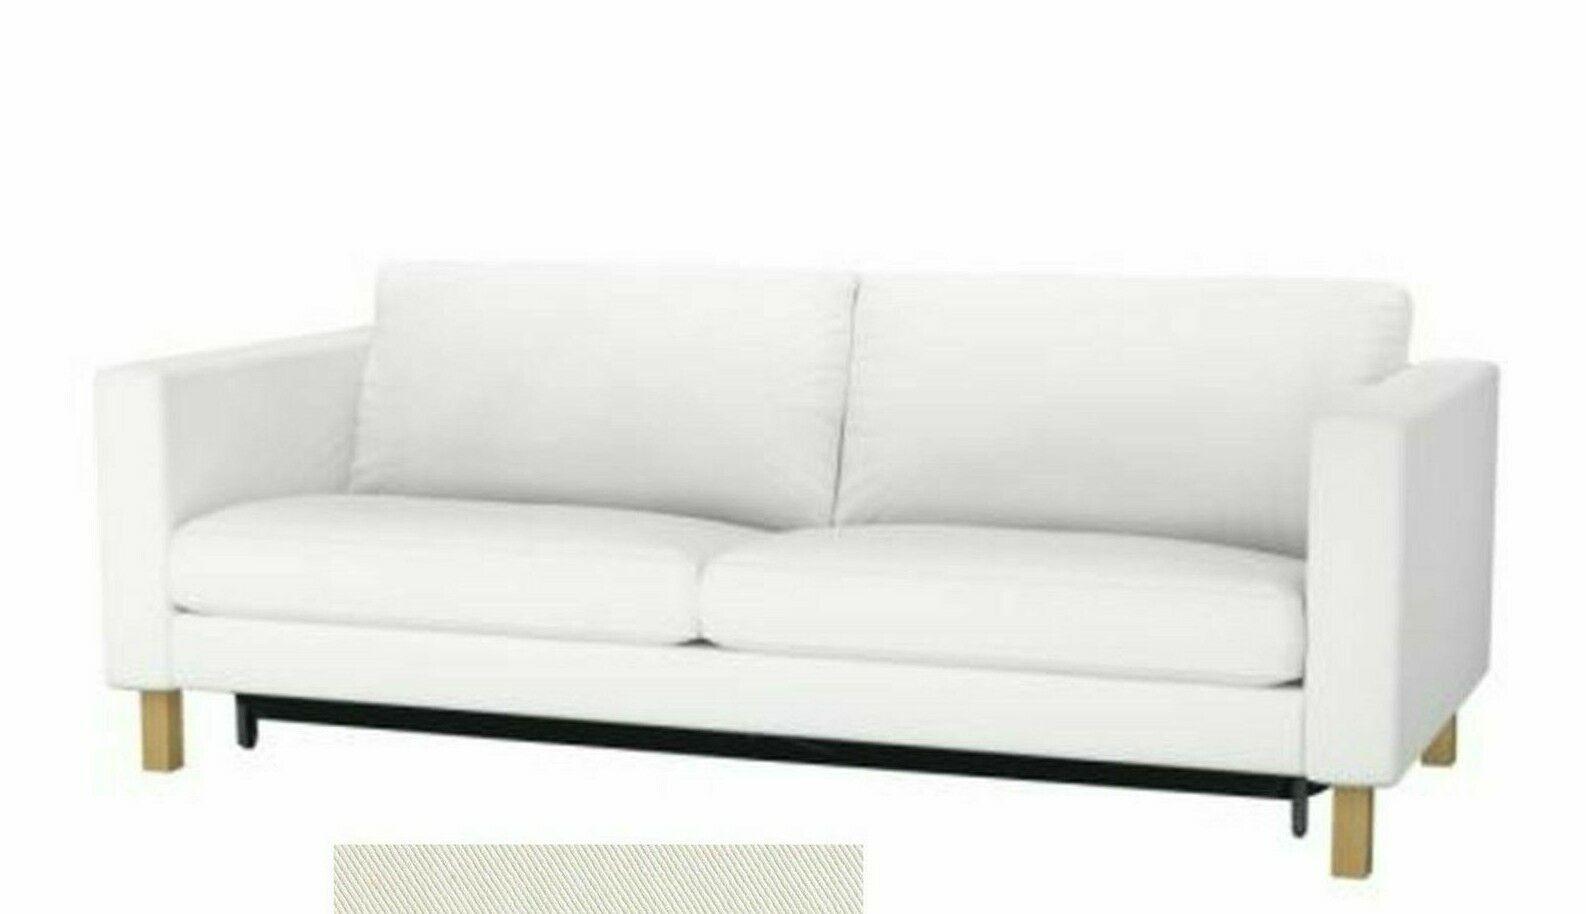 Ikea Cover For Karlstad Sofabed New Blekinge White Cotton Sofa